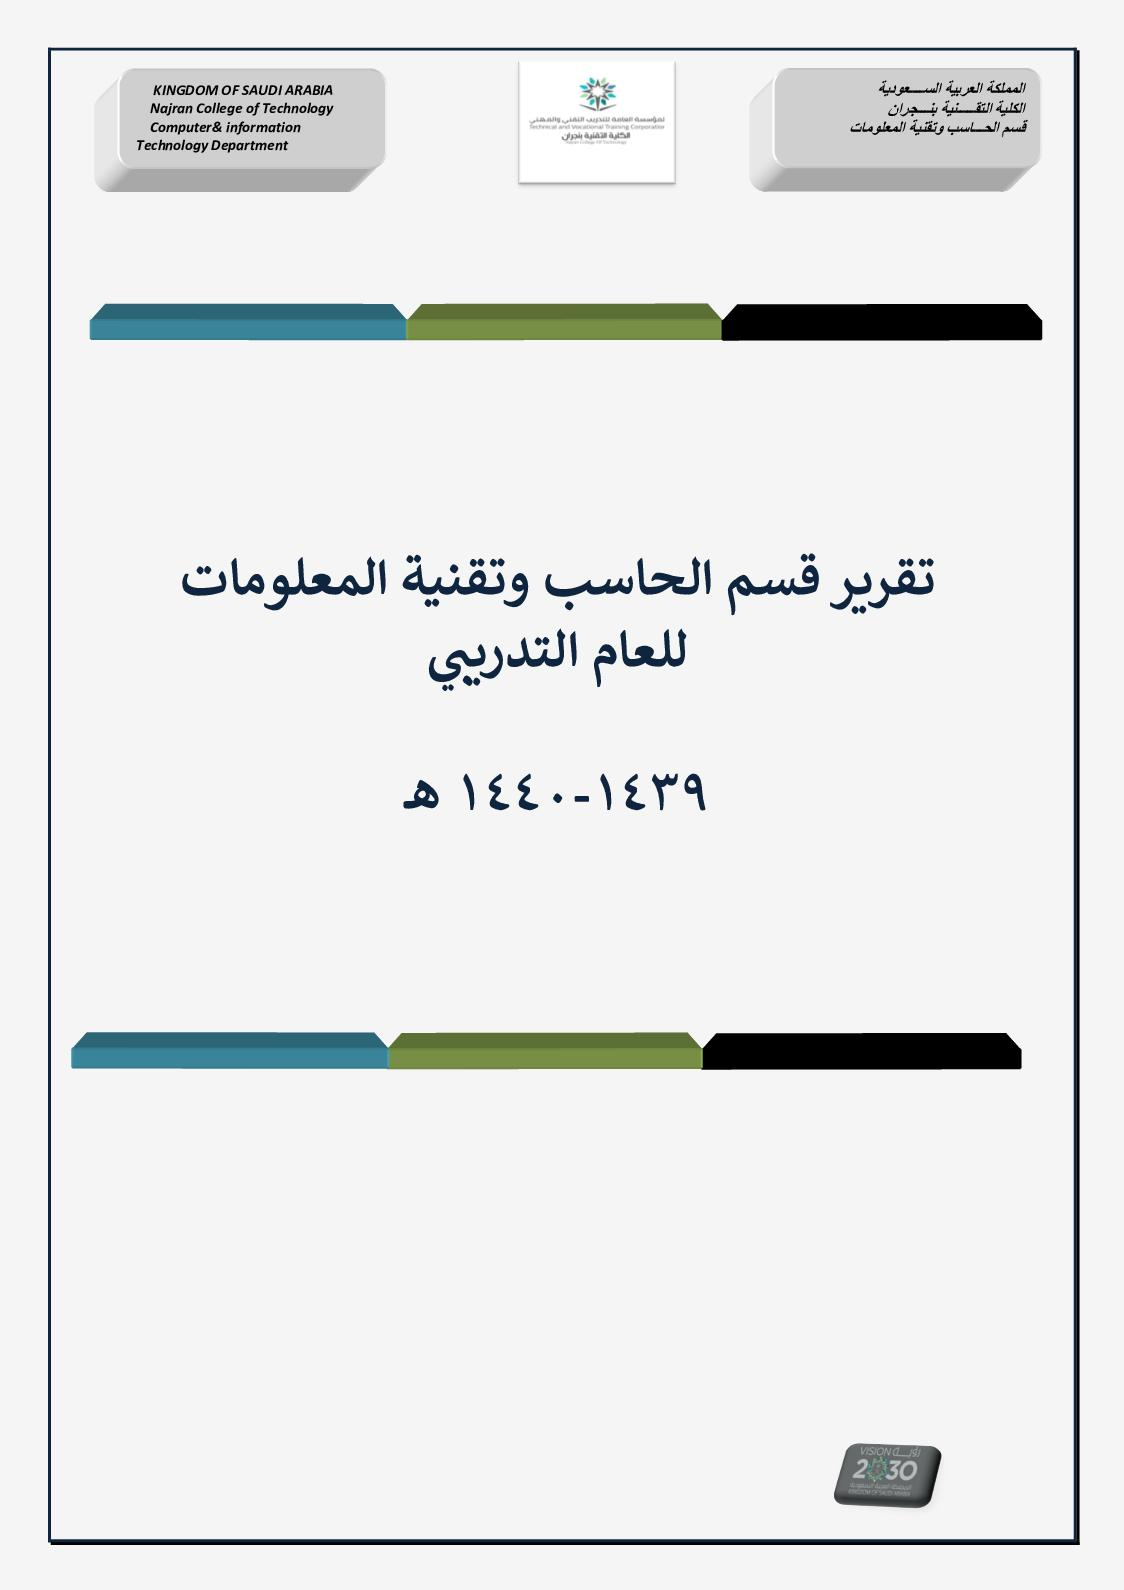 Calameo التقرير النهائي لقسم تقنية الحاسب الكلية التقنية بنجران